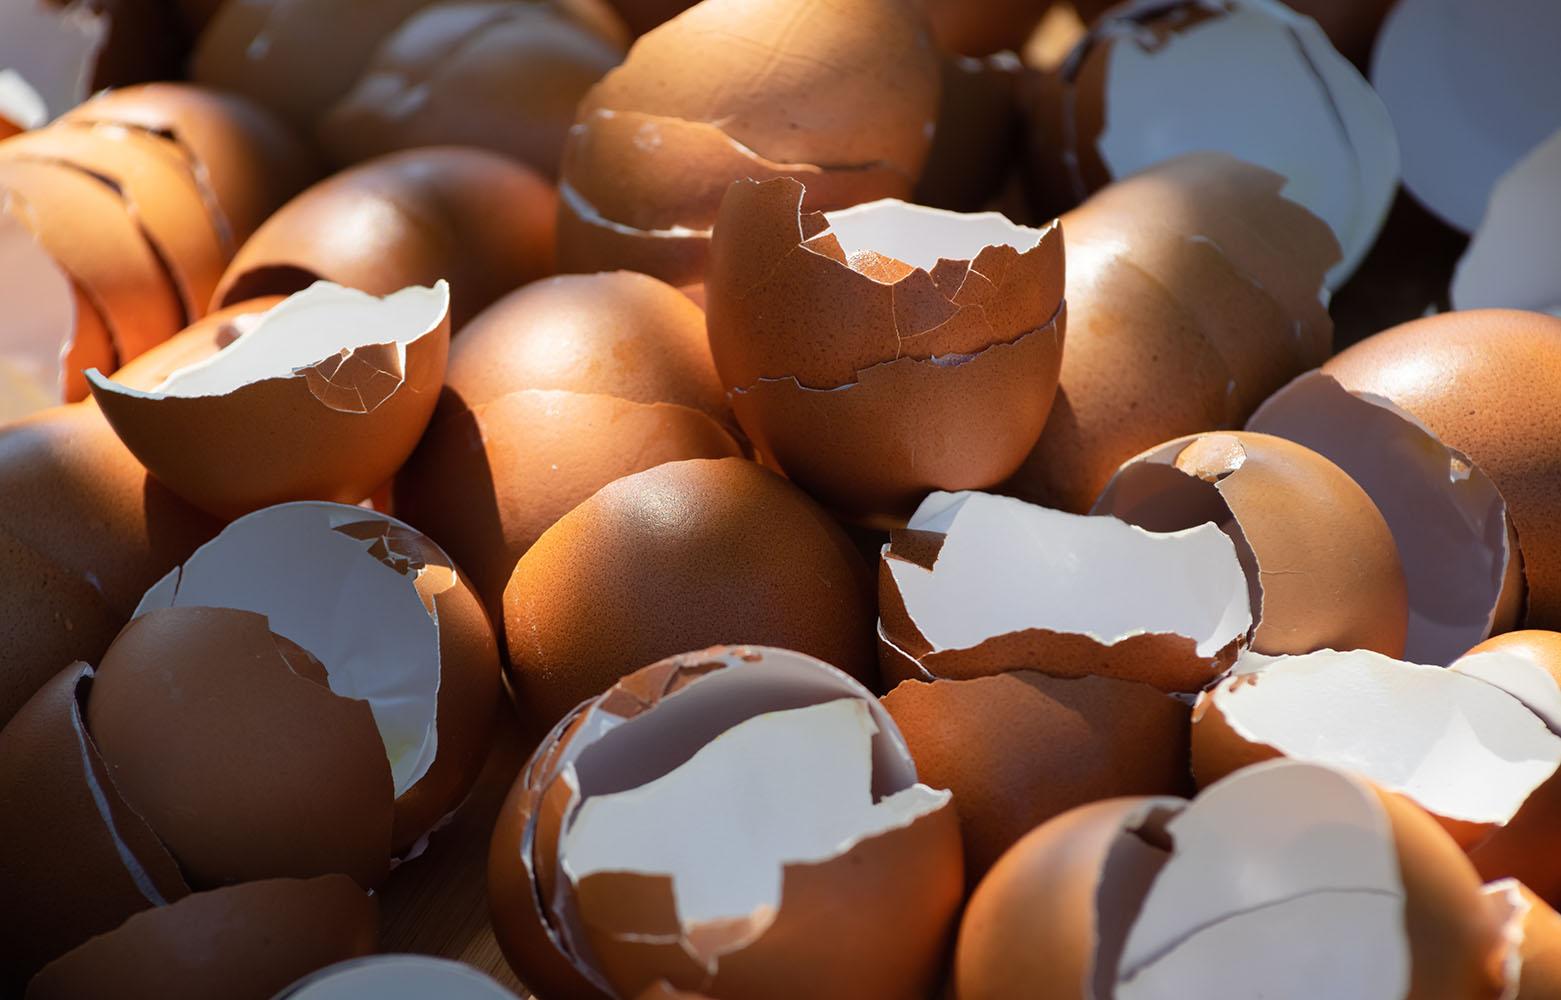 Unwashed Eggshells